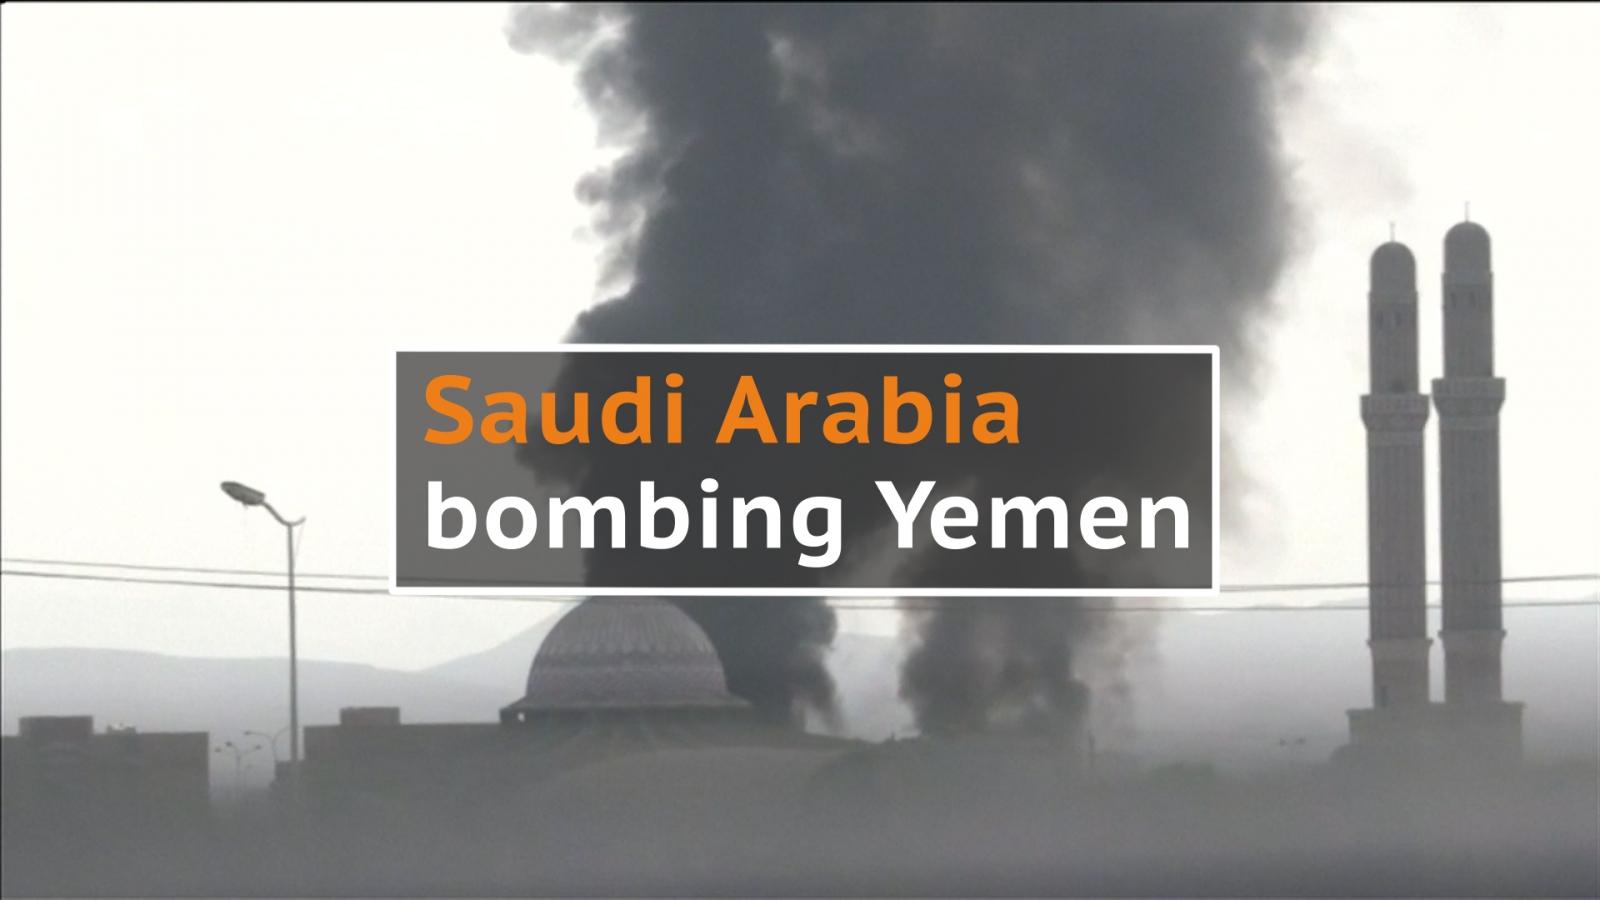 Saudi Arabia bombing Yemen